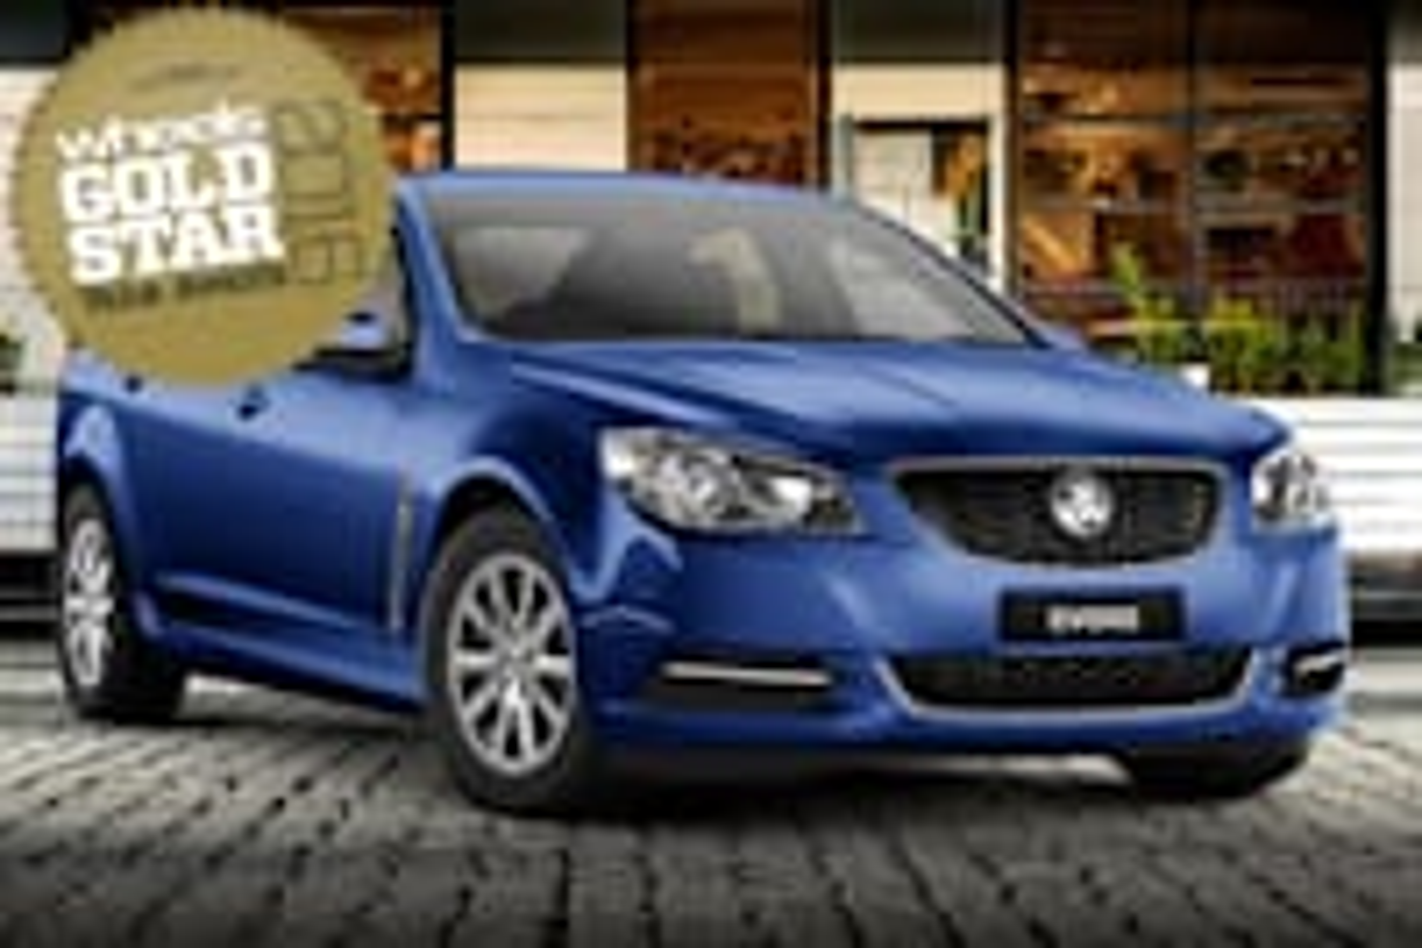 Australia's Best Value Large Cars under $45K